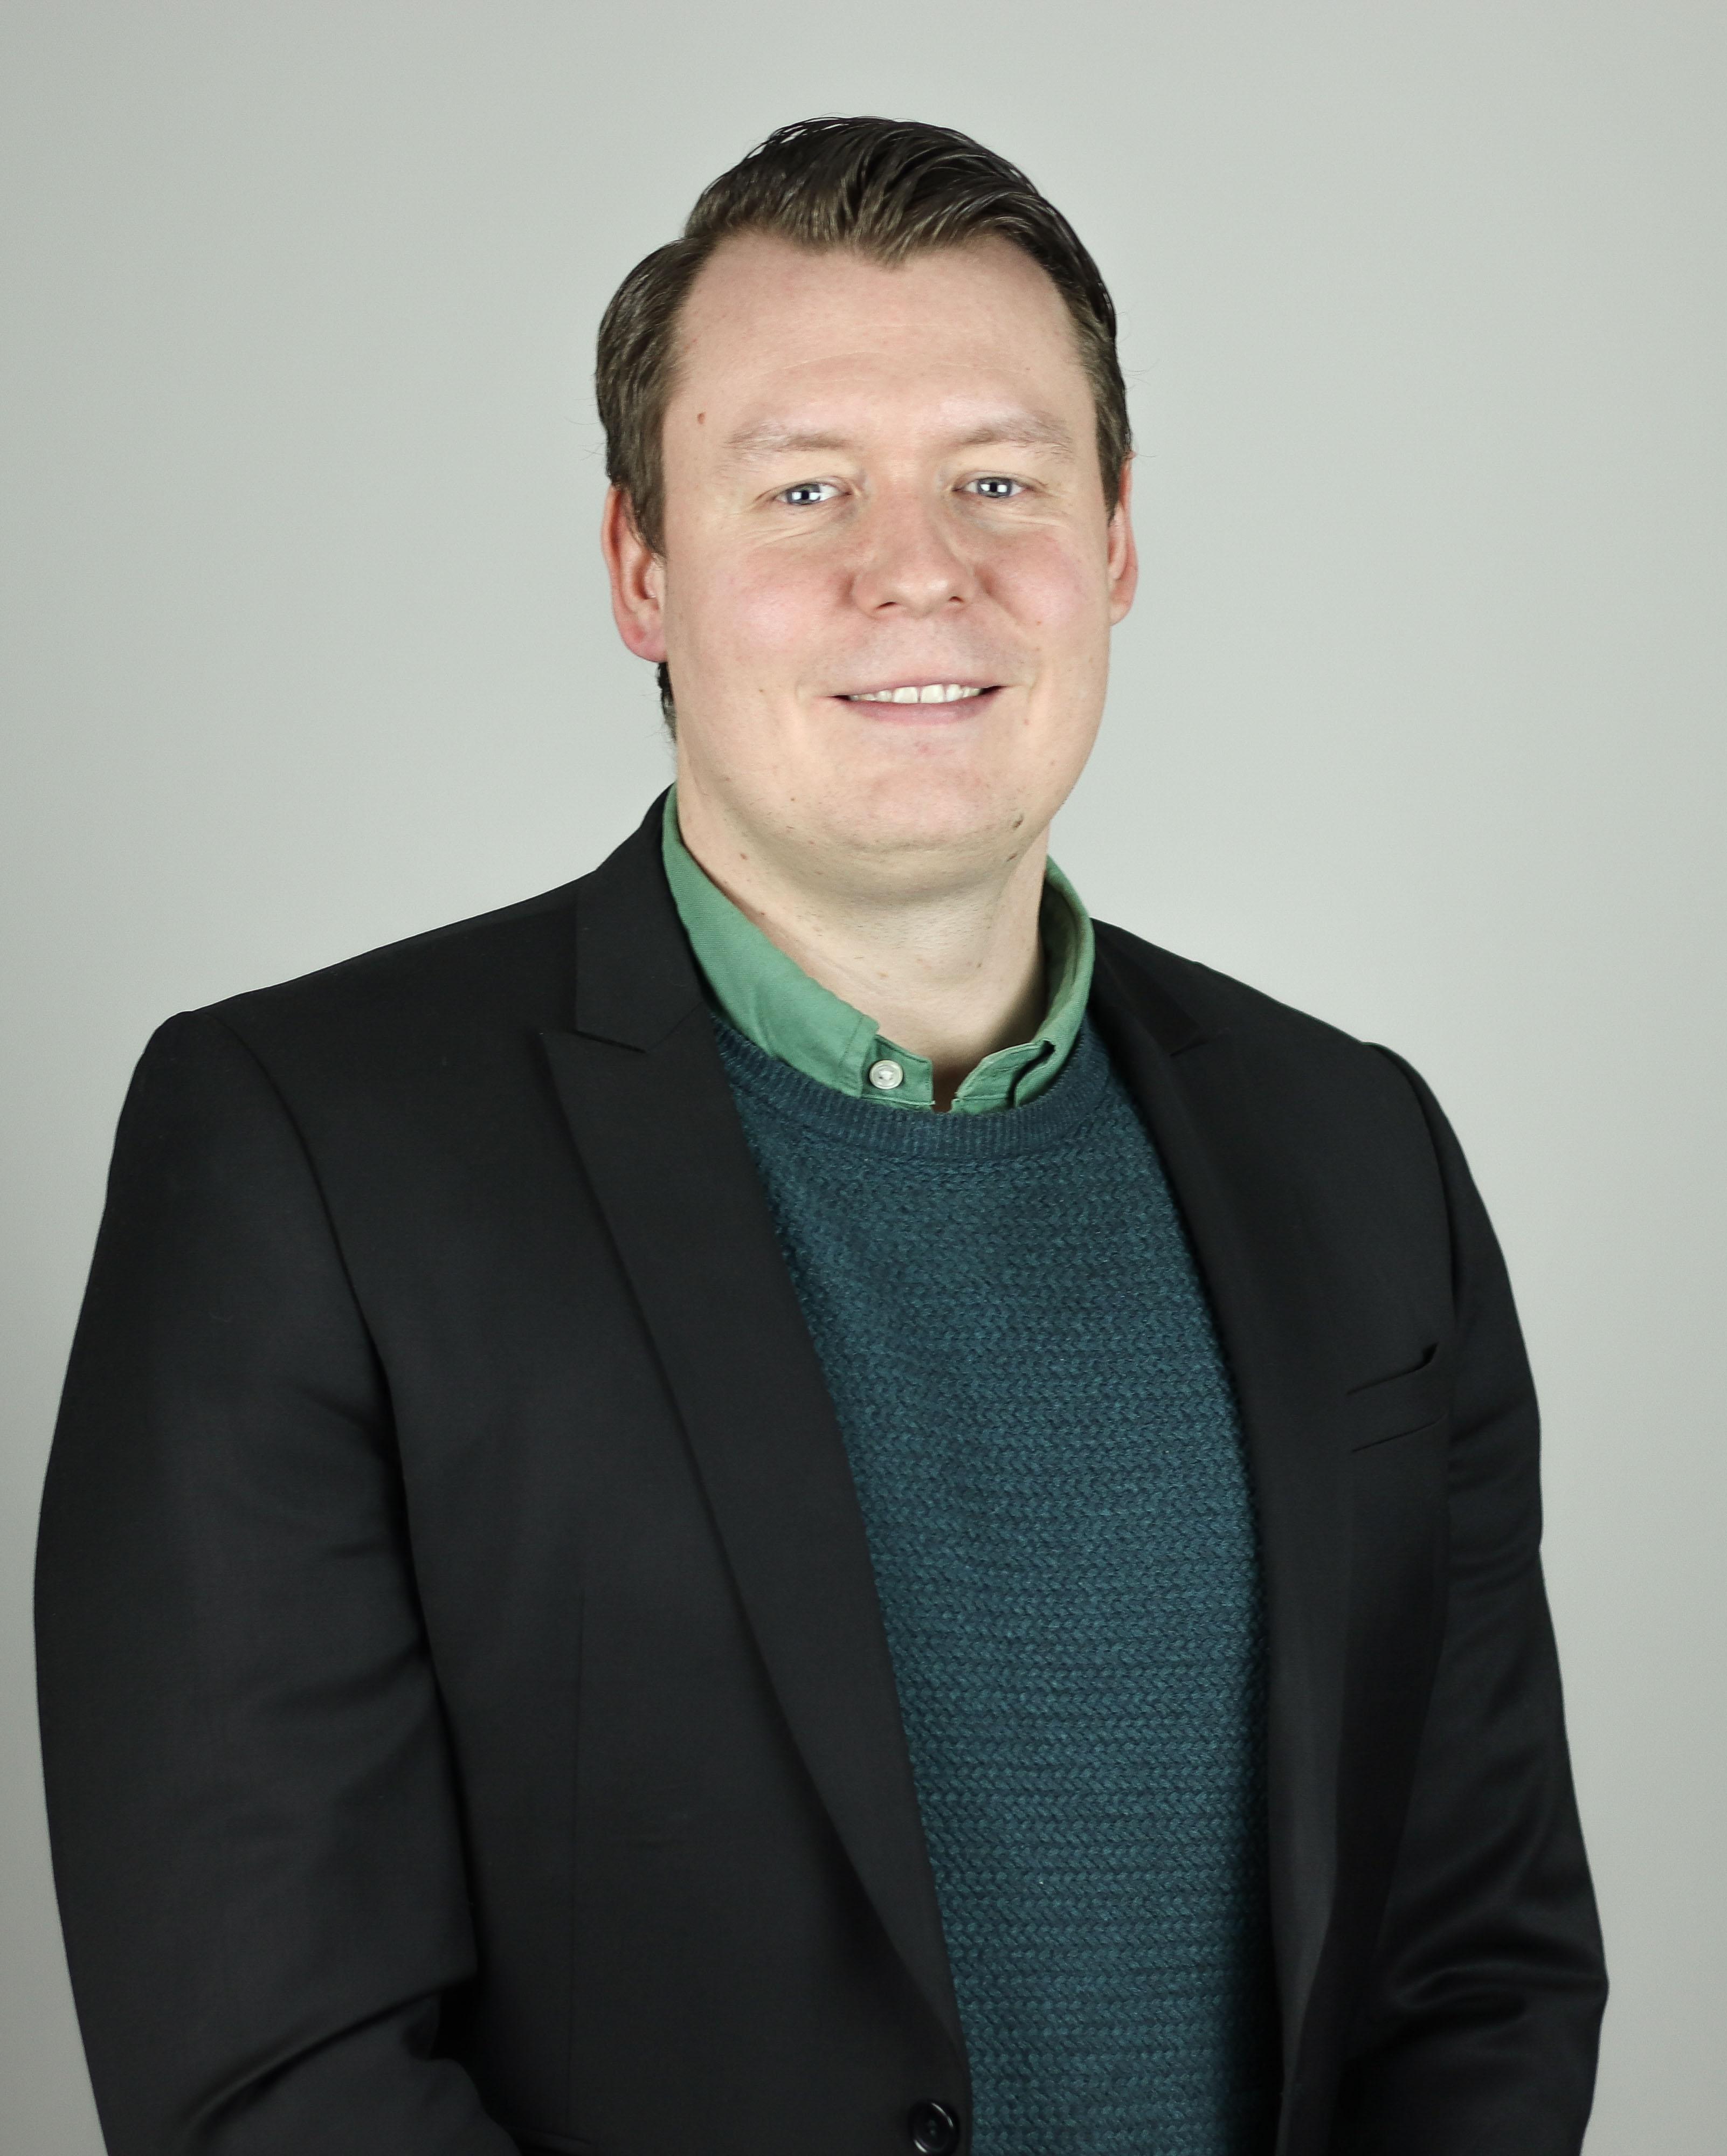 Dennis Rohde Ladegaard